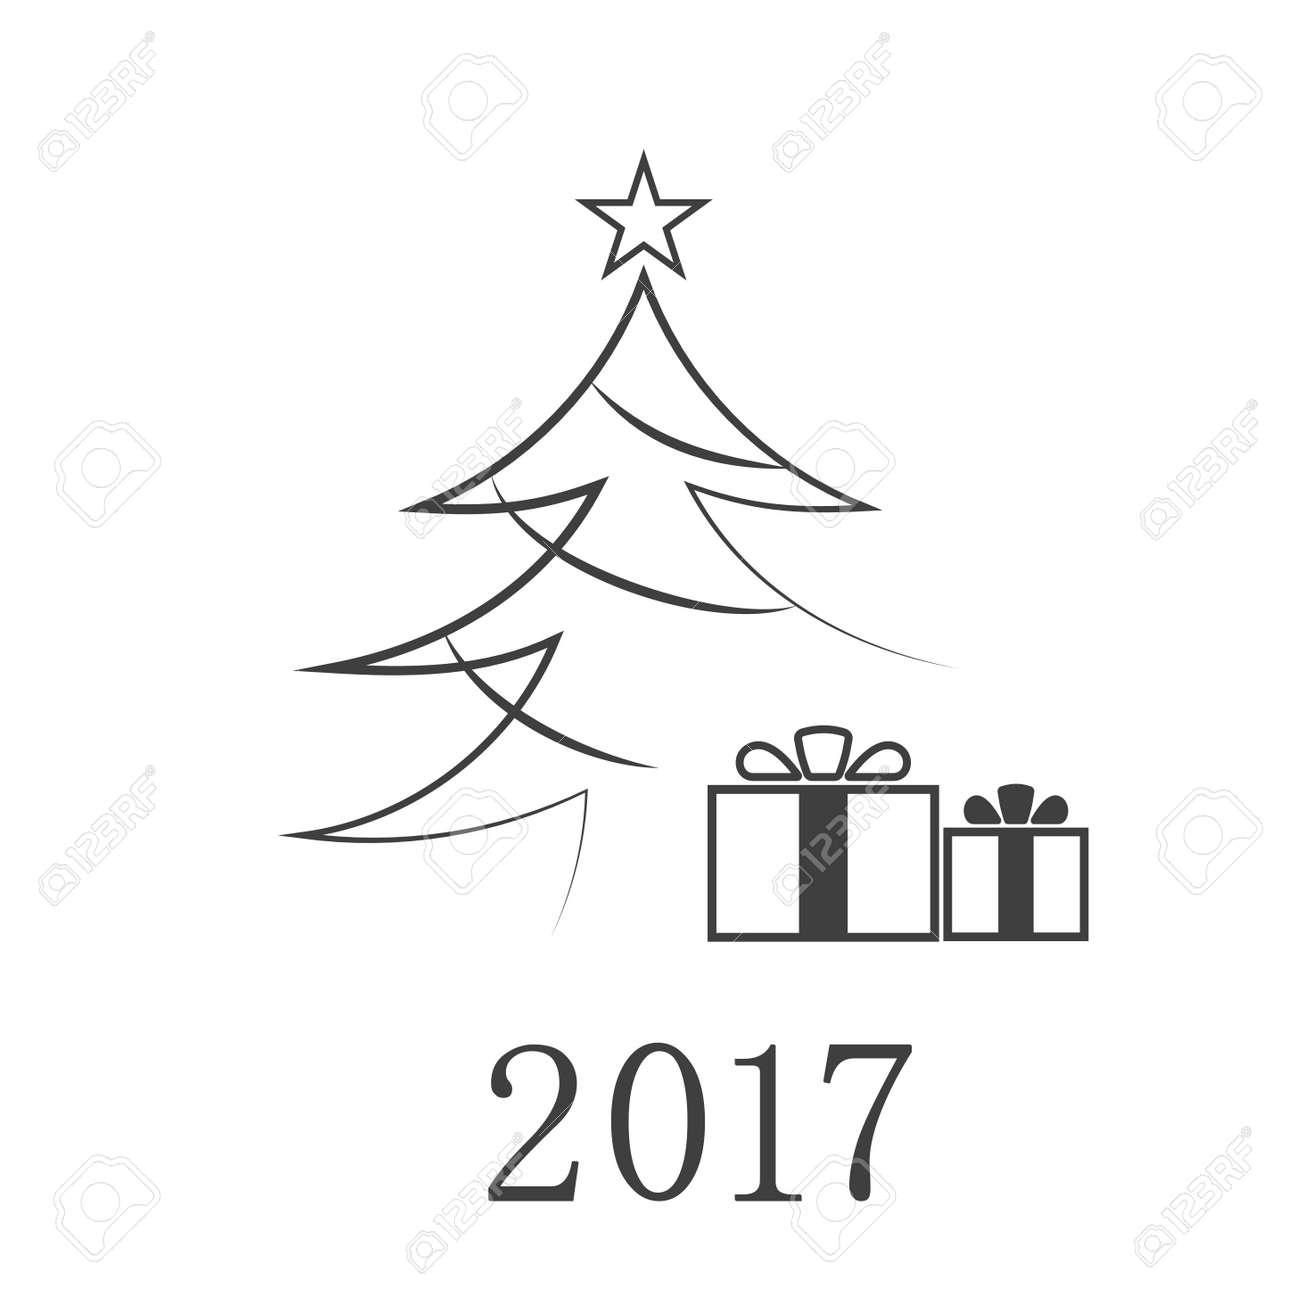 Carte De Sapin De Noel Avec Cadeau Numero 2017 Icone De Dessin